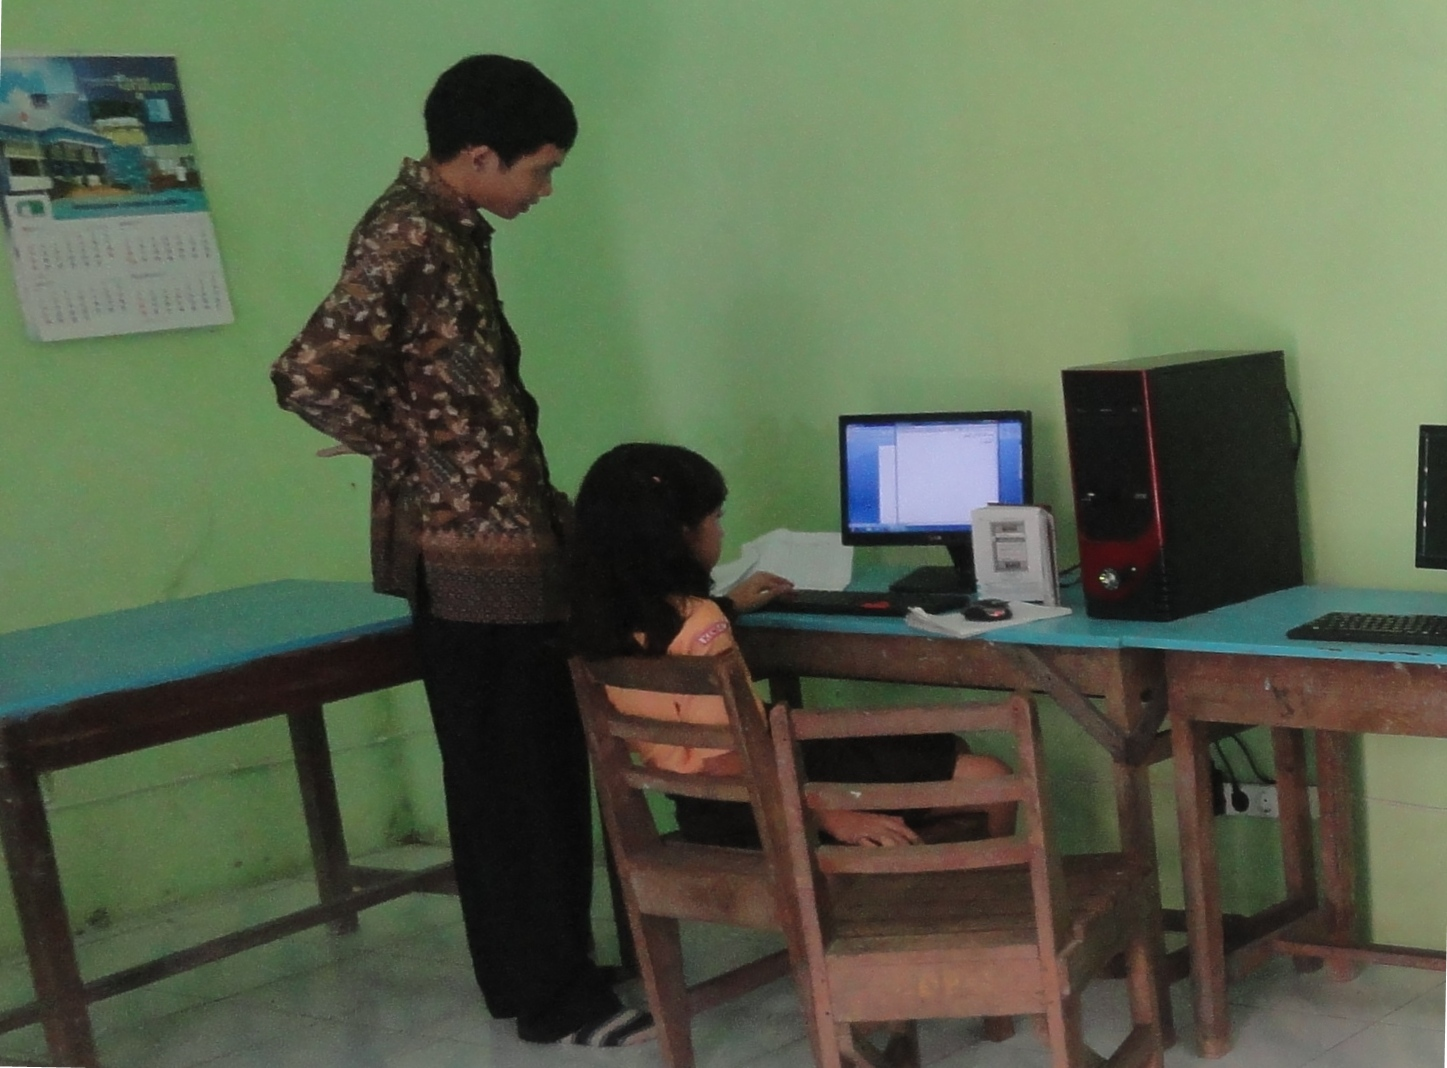 Persiapan Lomba Lk Tiki Sd 2013 Website Resmi Sd Negeri 1 Patukangan Kendal